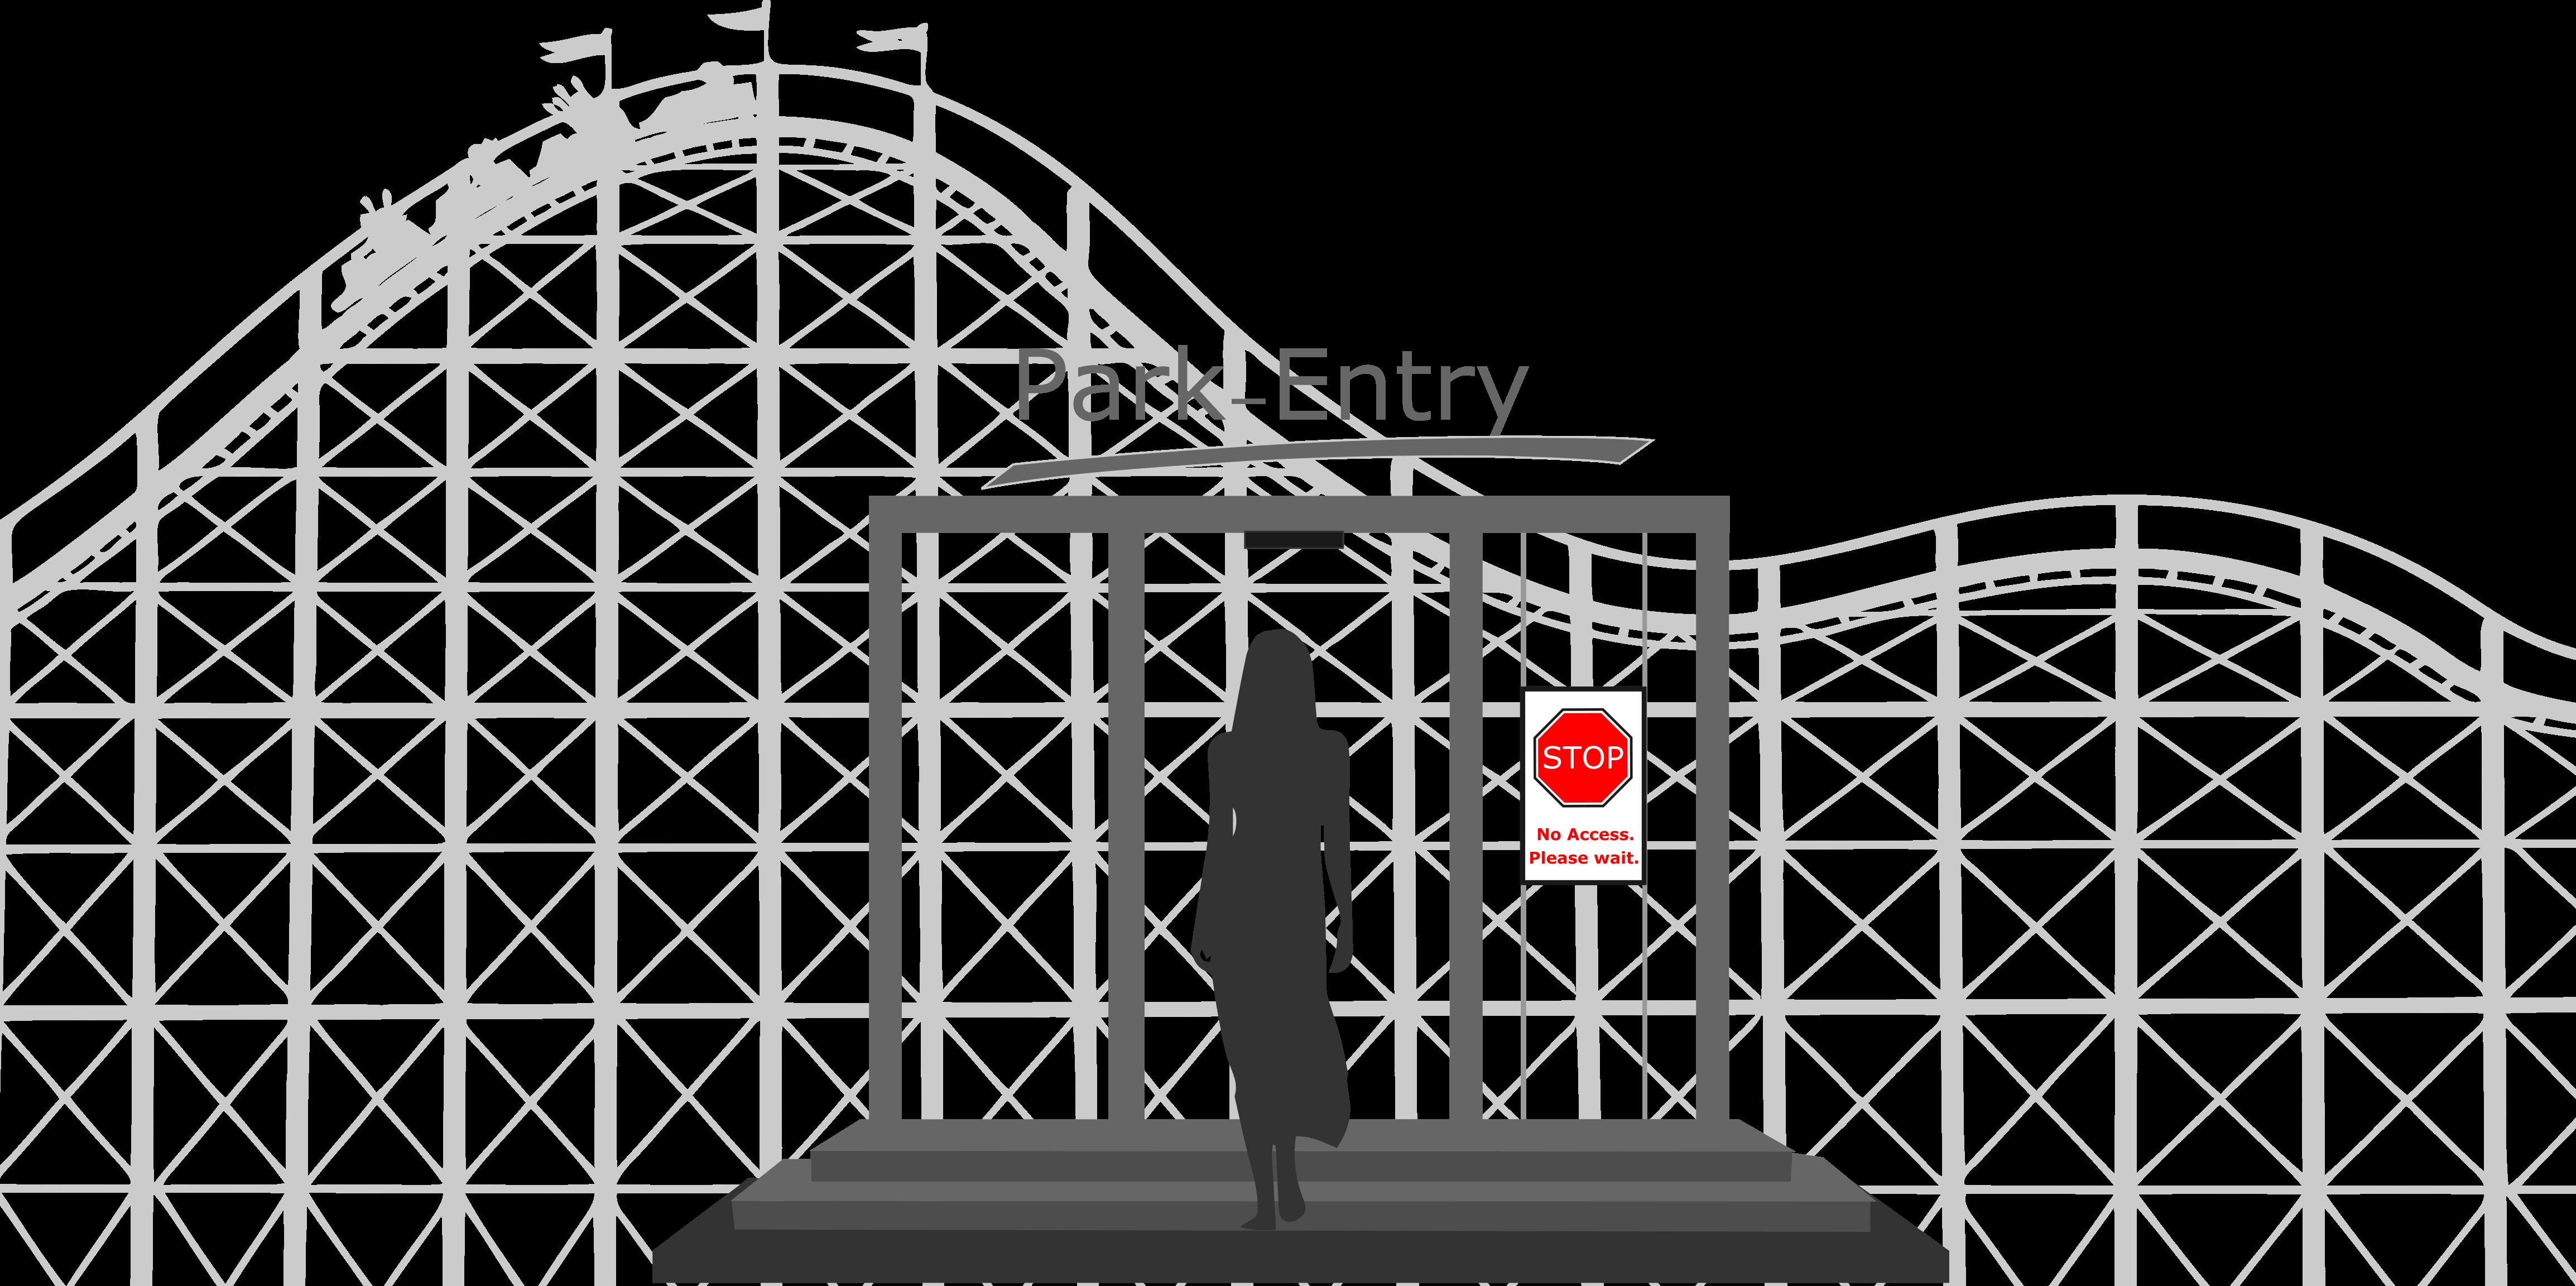 Themepark crowd management traffic lights / access control